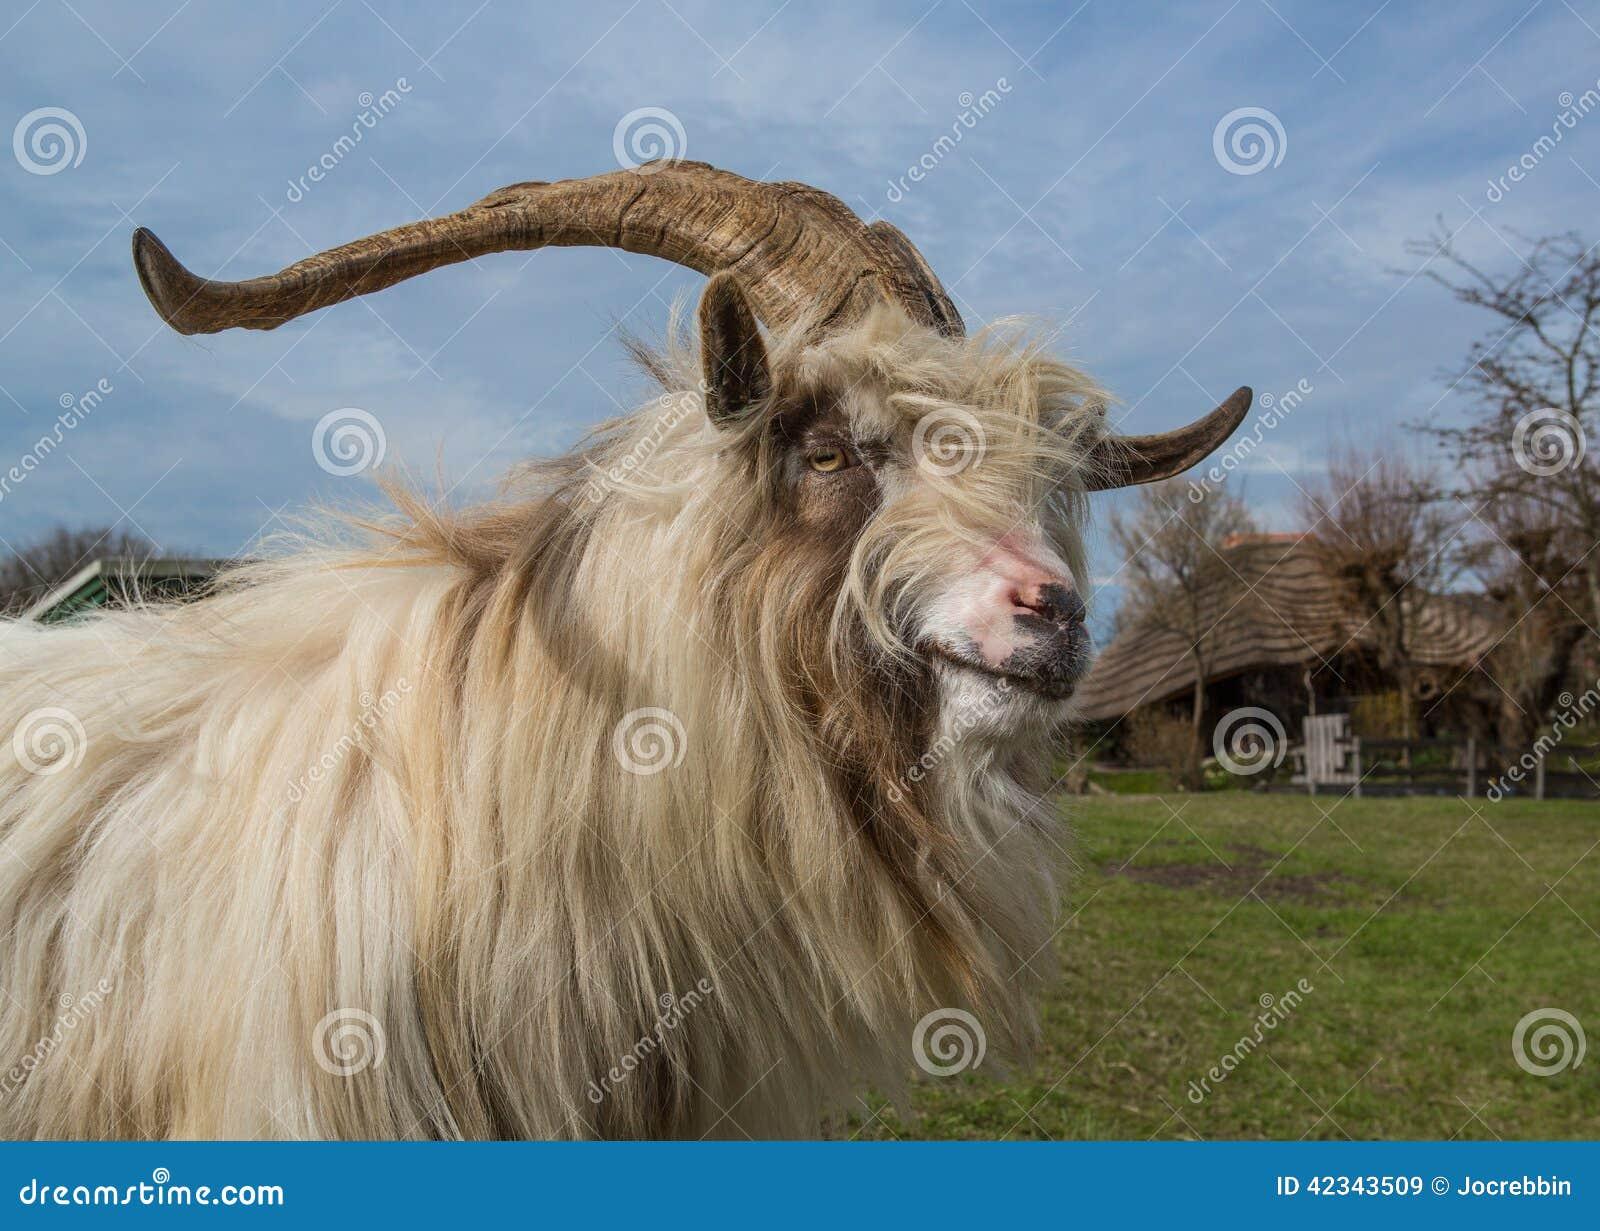 Long Horned, Long Hair Dutch Sheep Stock Photo